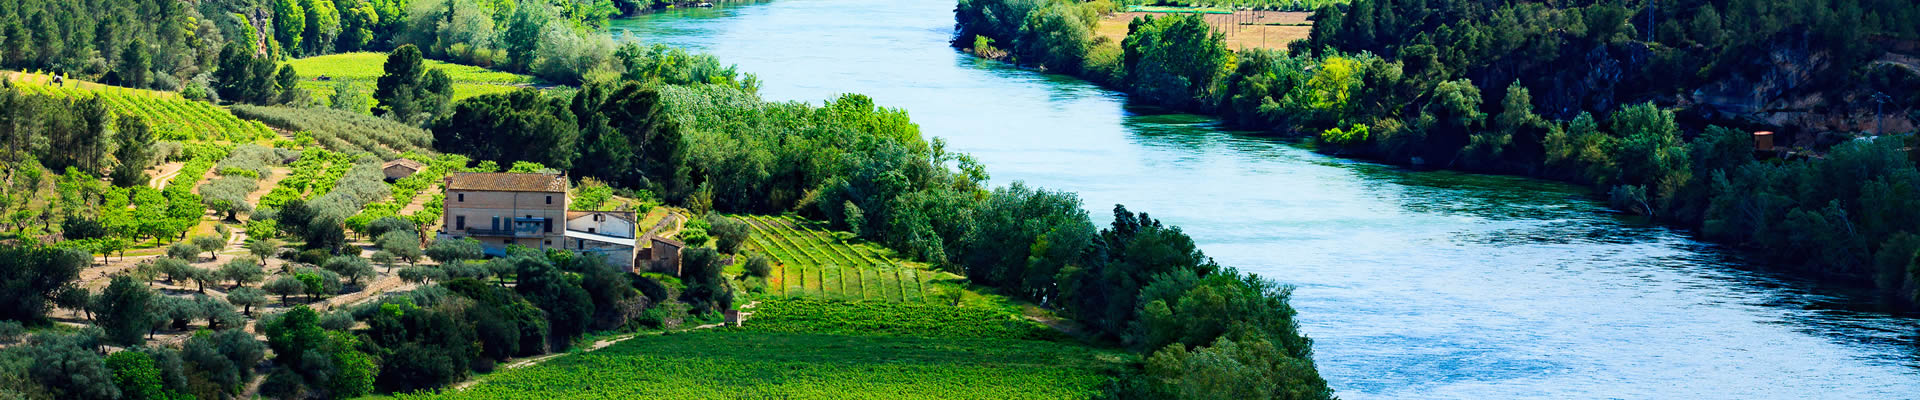 Spainish vineyards nestling a river